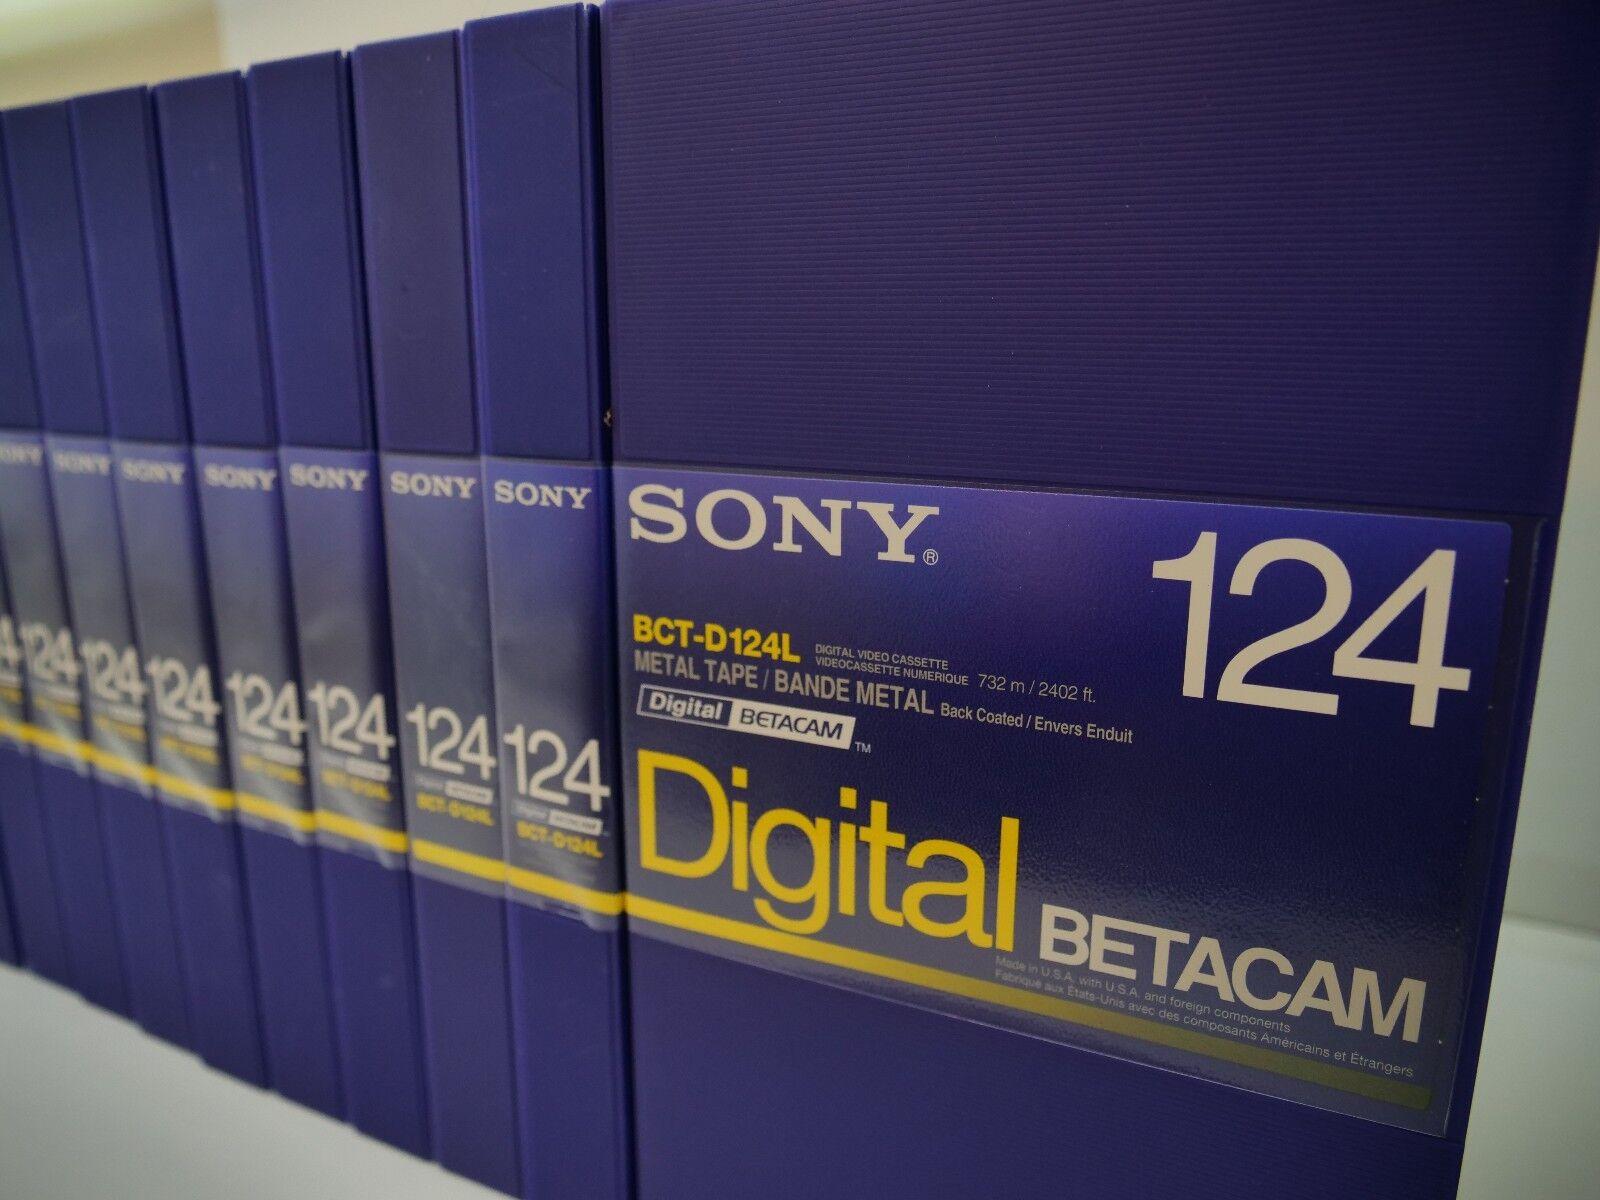 Lote de 10 Sony BCT-D94L Digital BetaCam